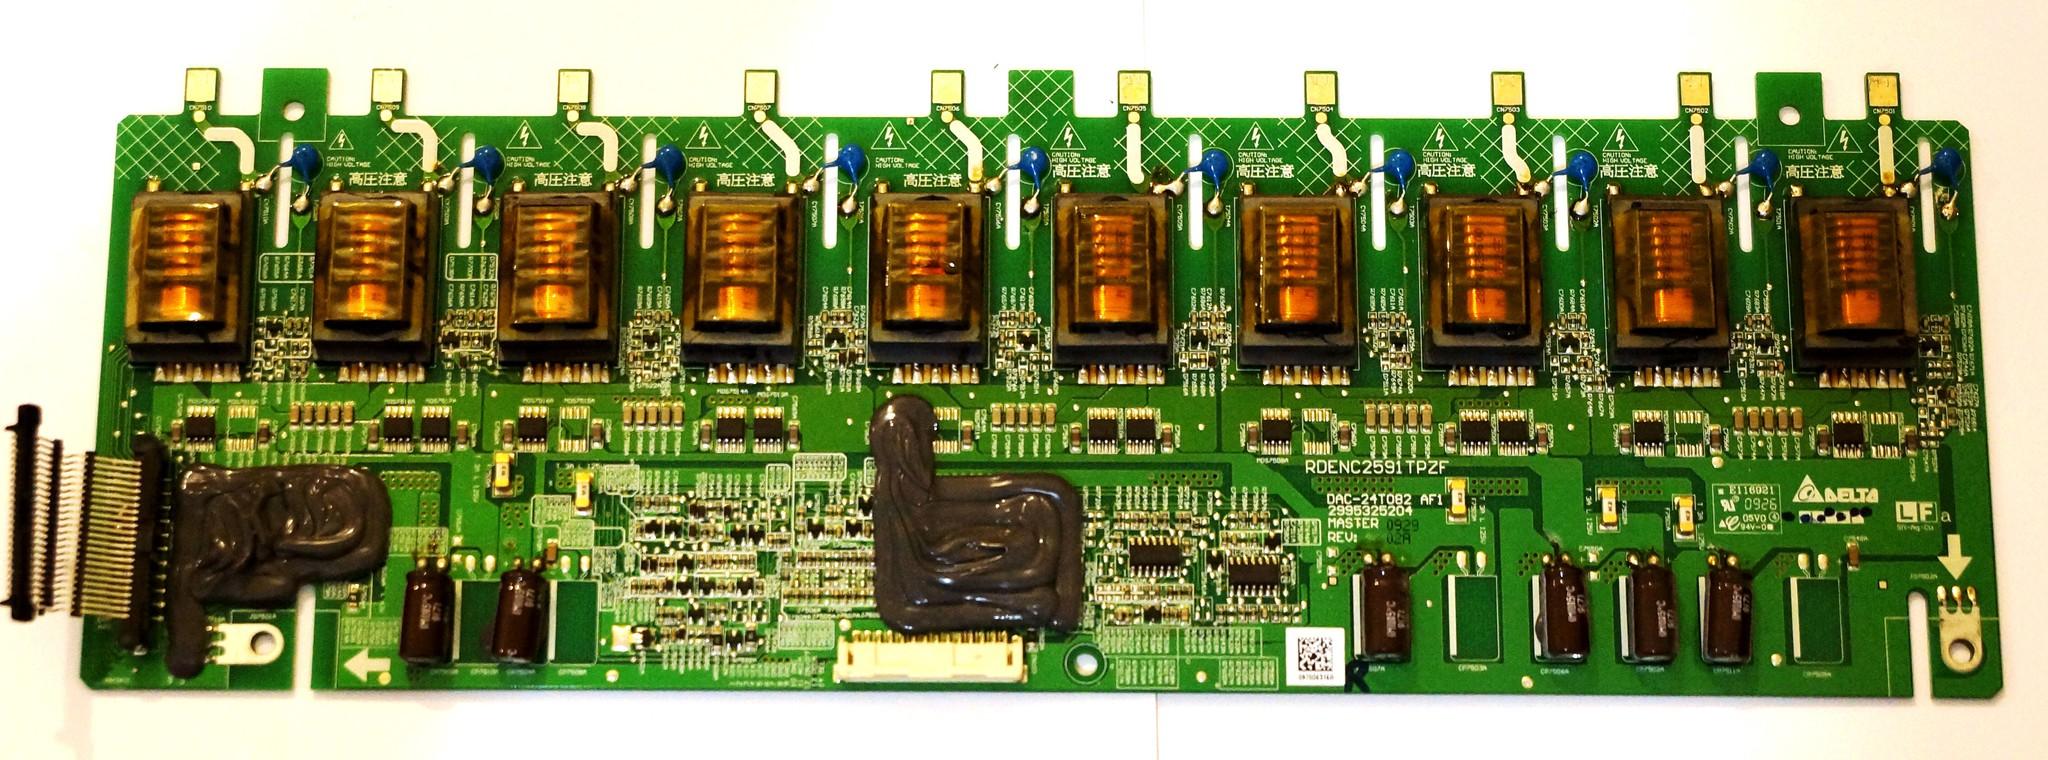 RDENC2591 TPZF